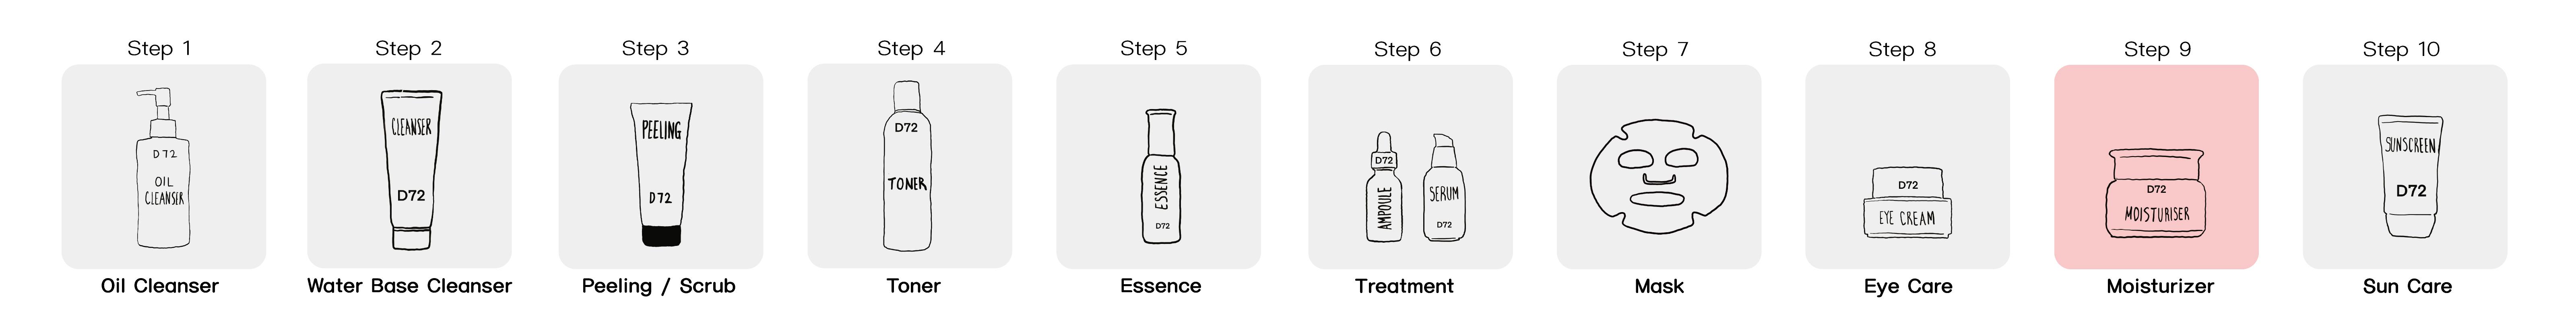 step9-moisturizer.jpg